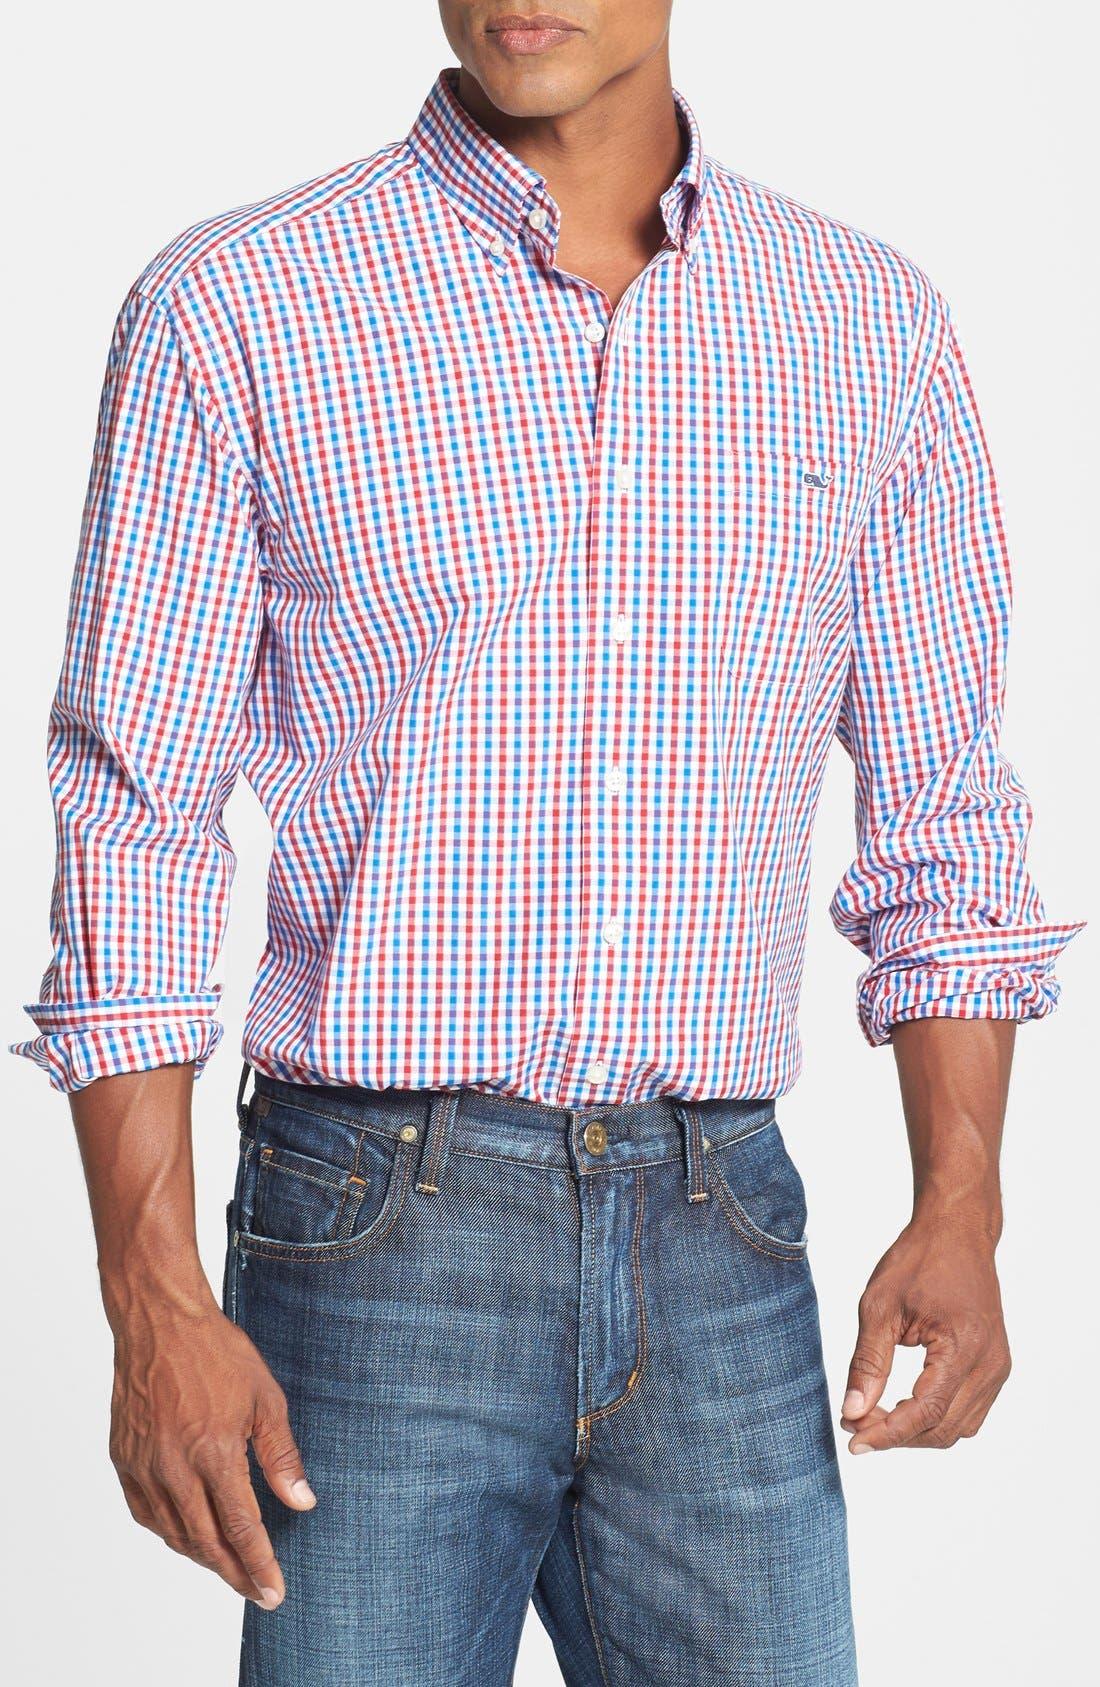 Alternate Image 1 Selected - Vineyard Vines 'Tucker - Bailey's Bay' Classic Fit Tattersall Sport Shirt